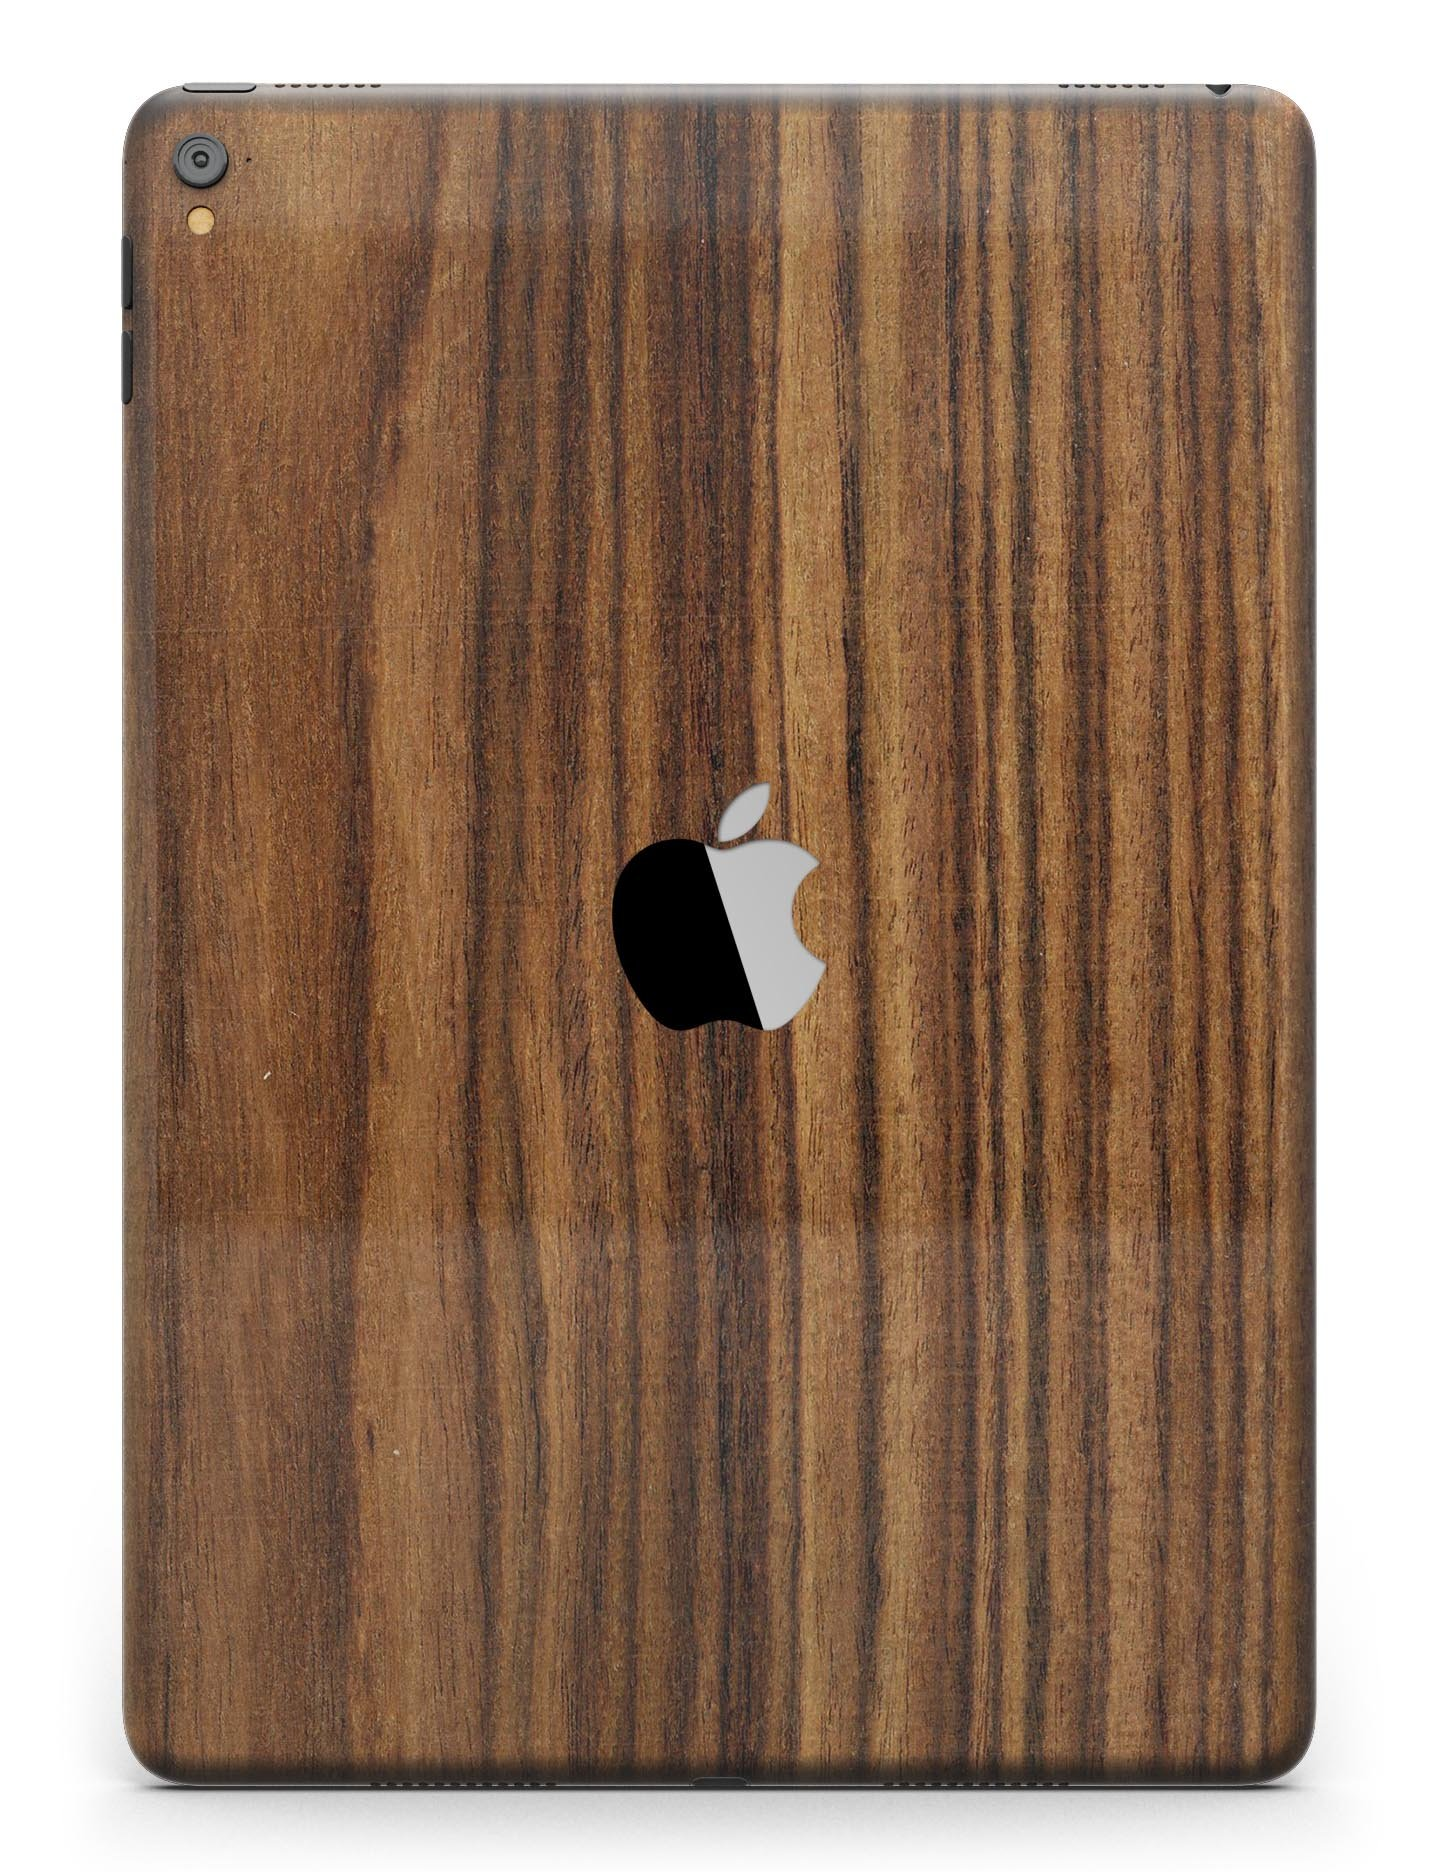 Wood Pattern Design Skinz Premium Full-Body Cover Wrap Decal Skin Kit for the Apple iPad 9.7-Inch 6th generation (A1893/A1954)- Bright Ebony Woodgrain